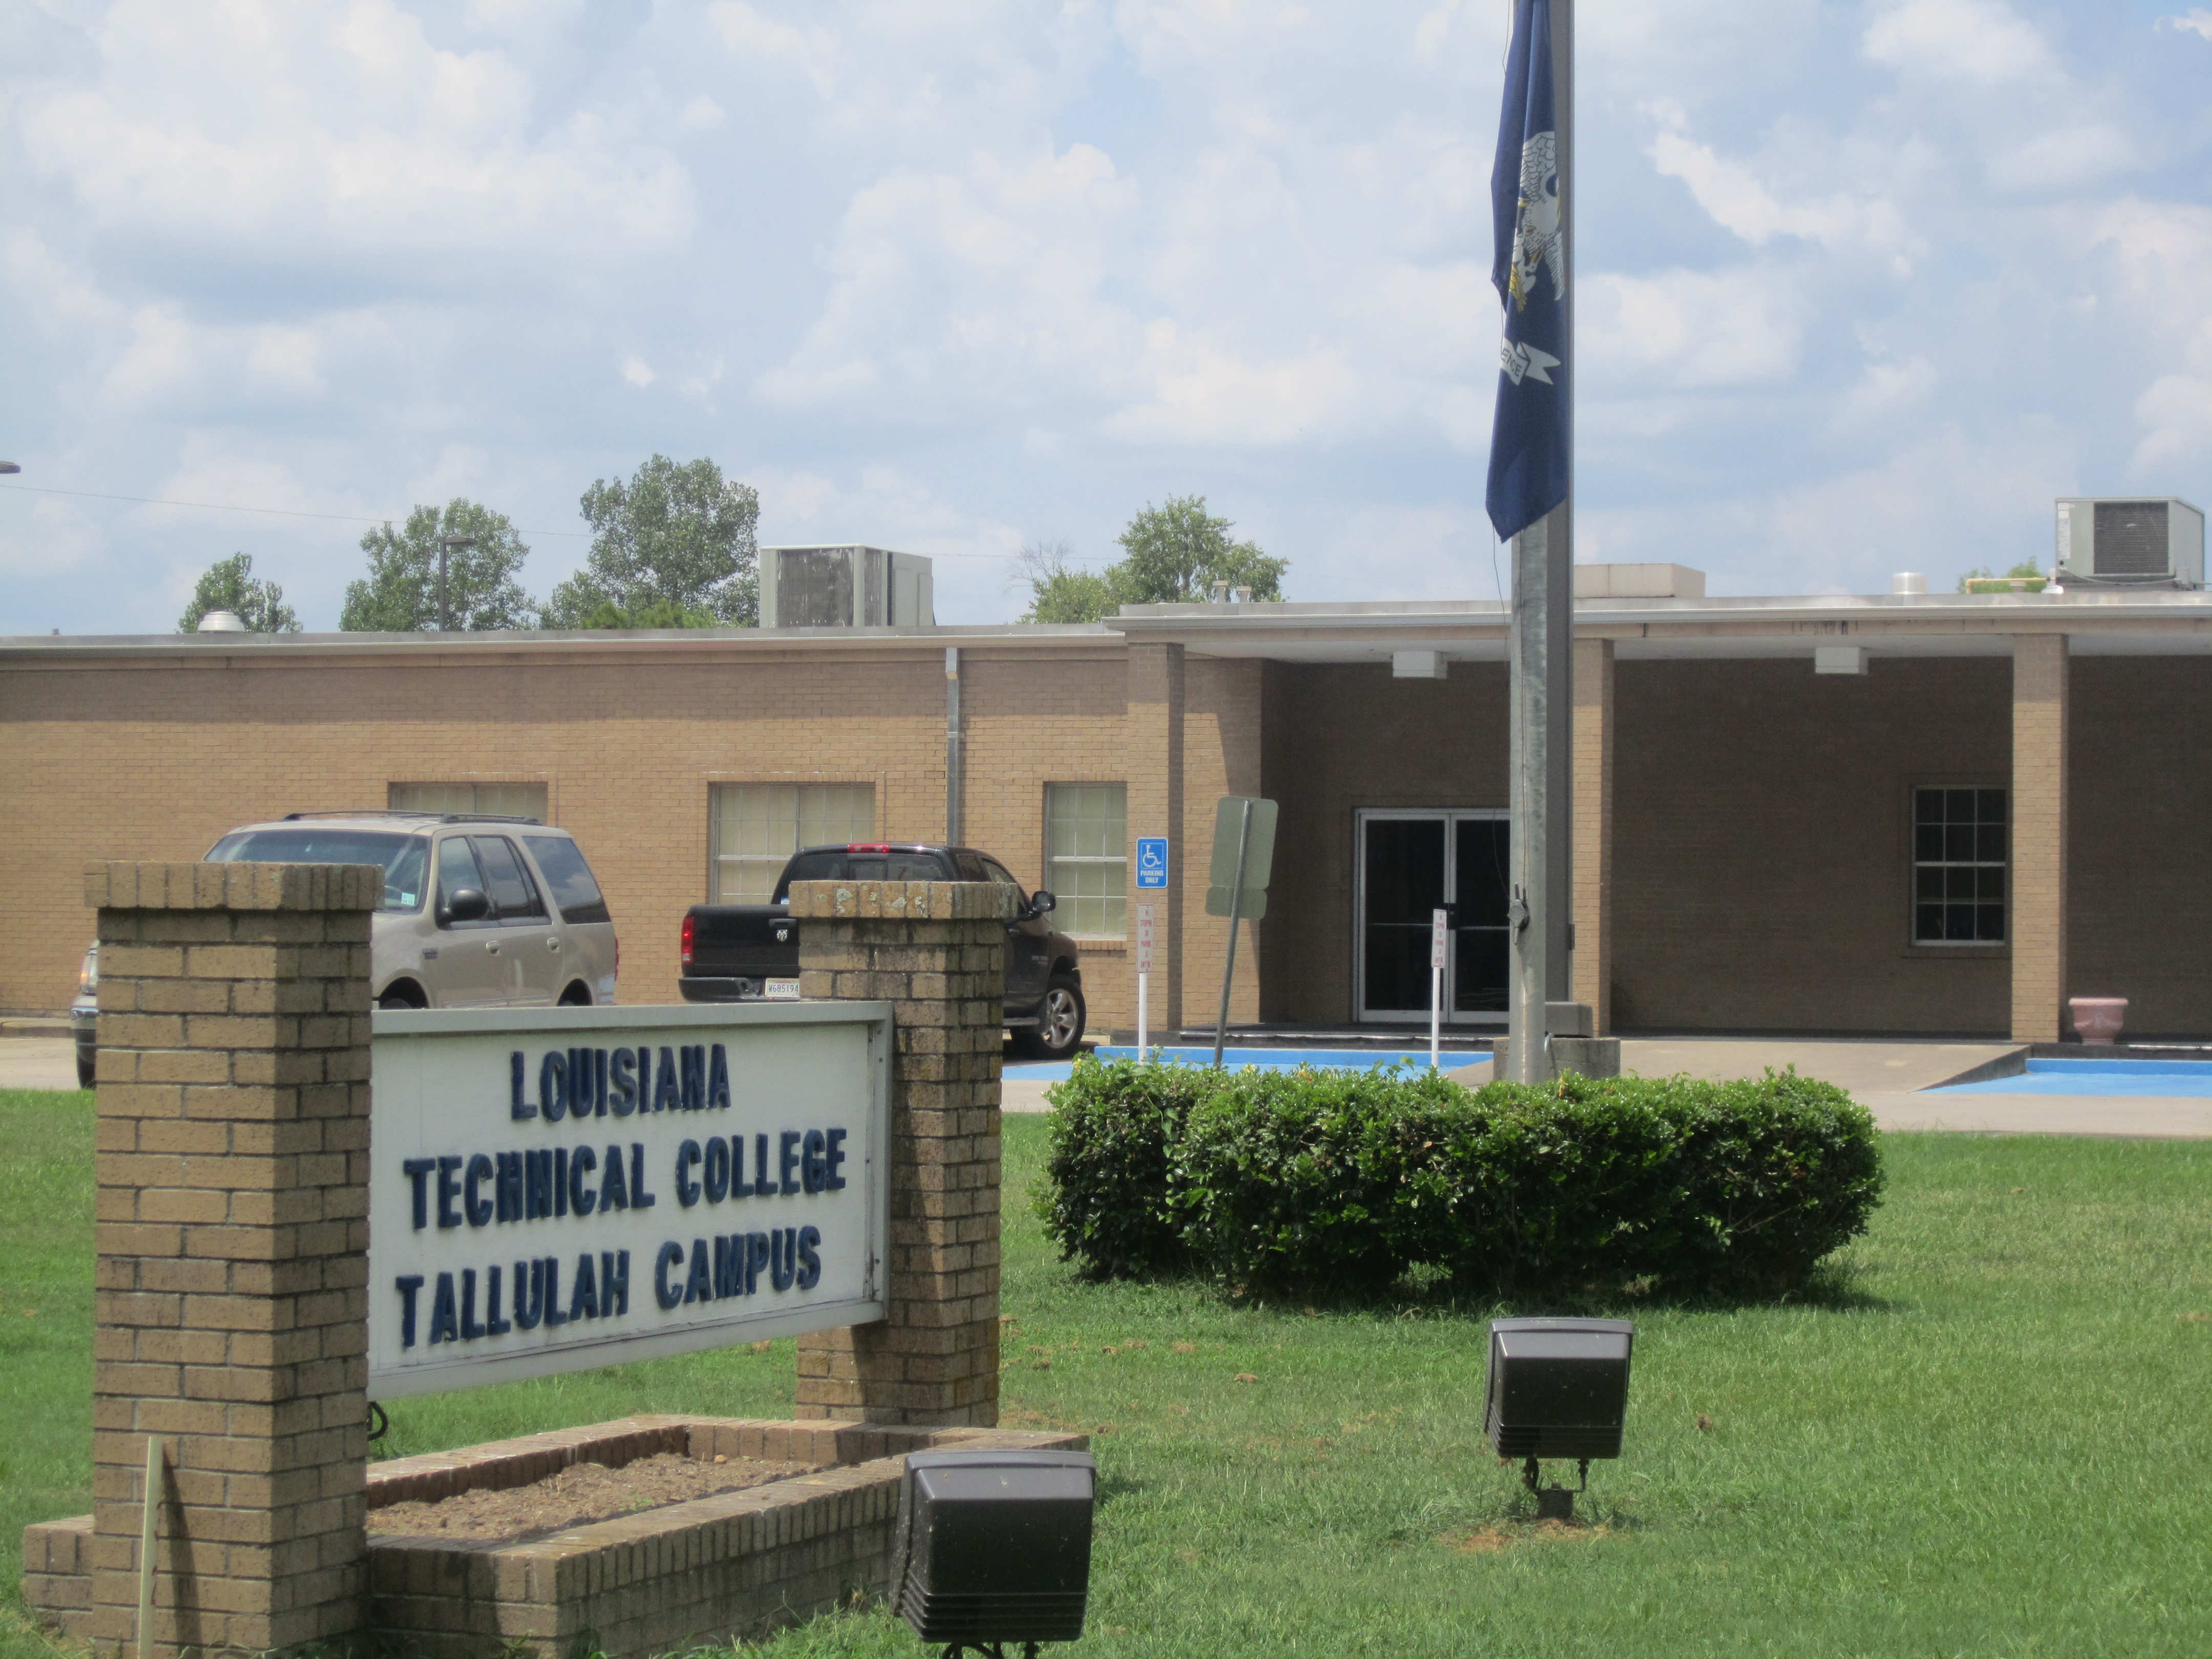 File:Louisiana Technical College, Tallulah campus IMG 0216.JPG ...